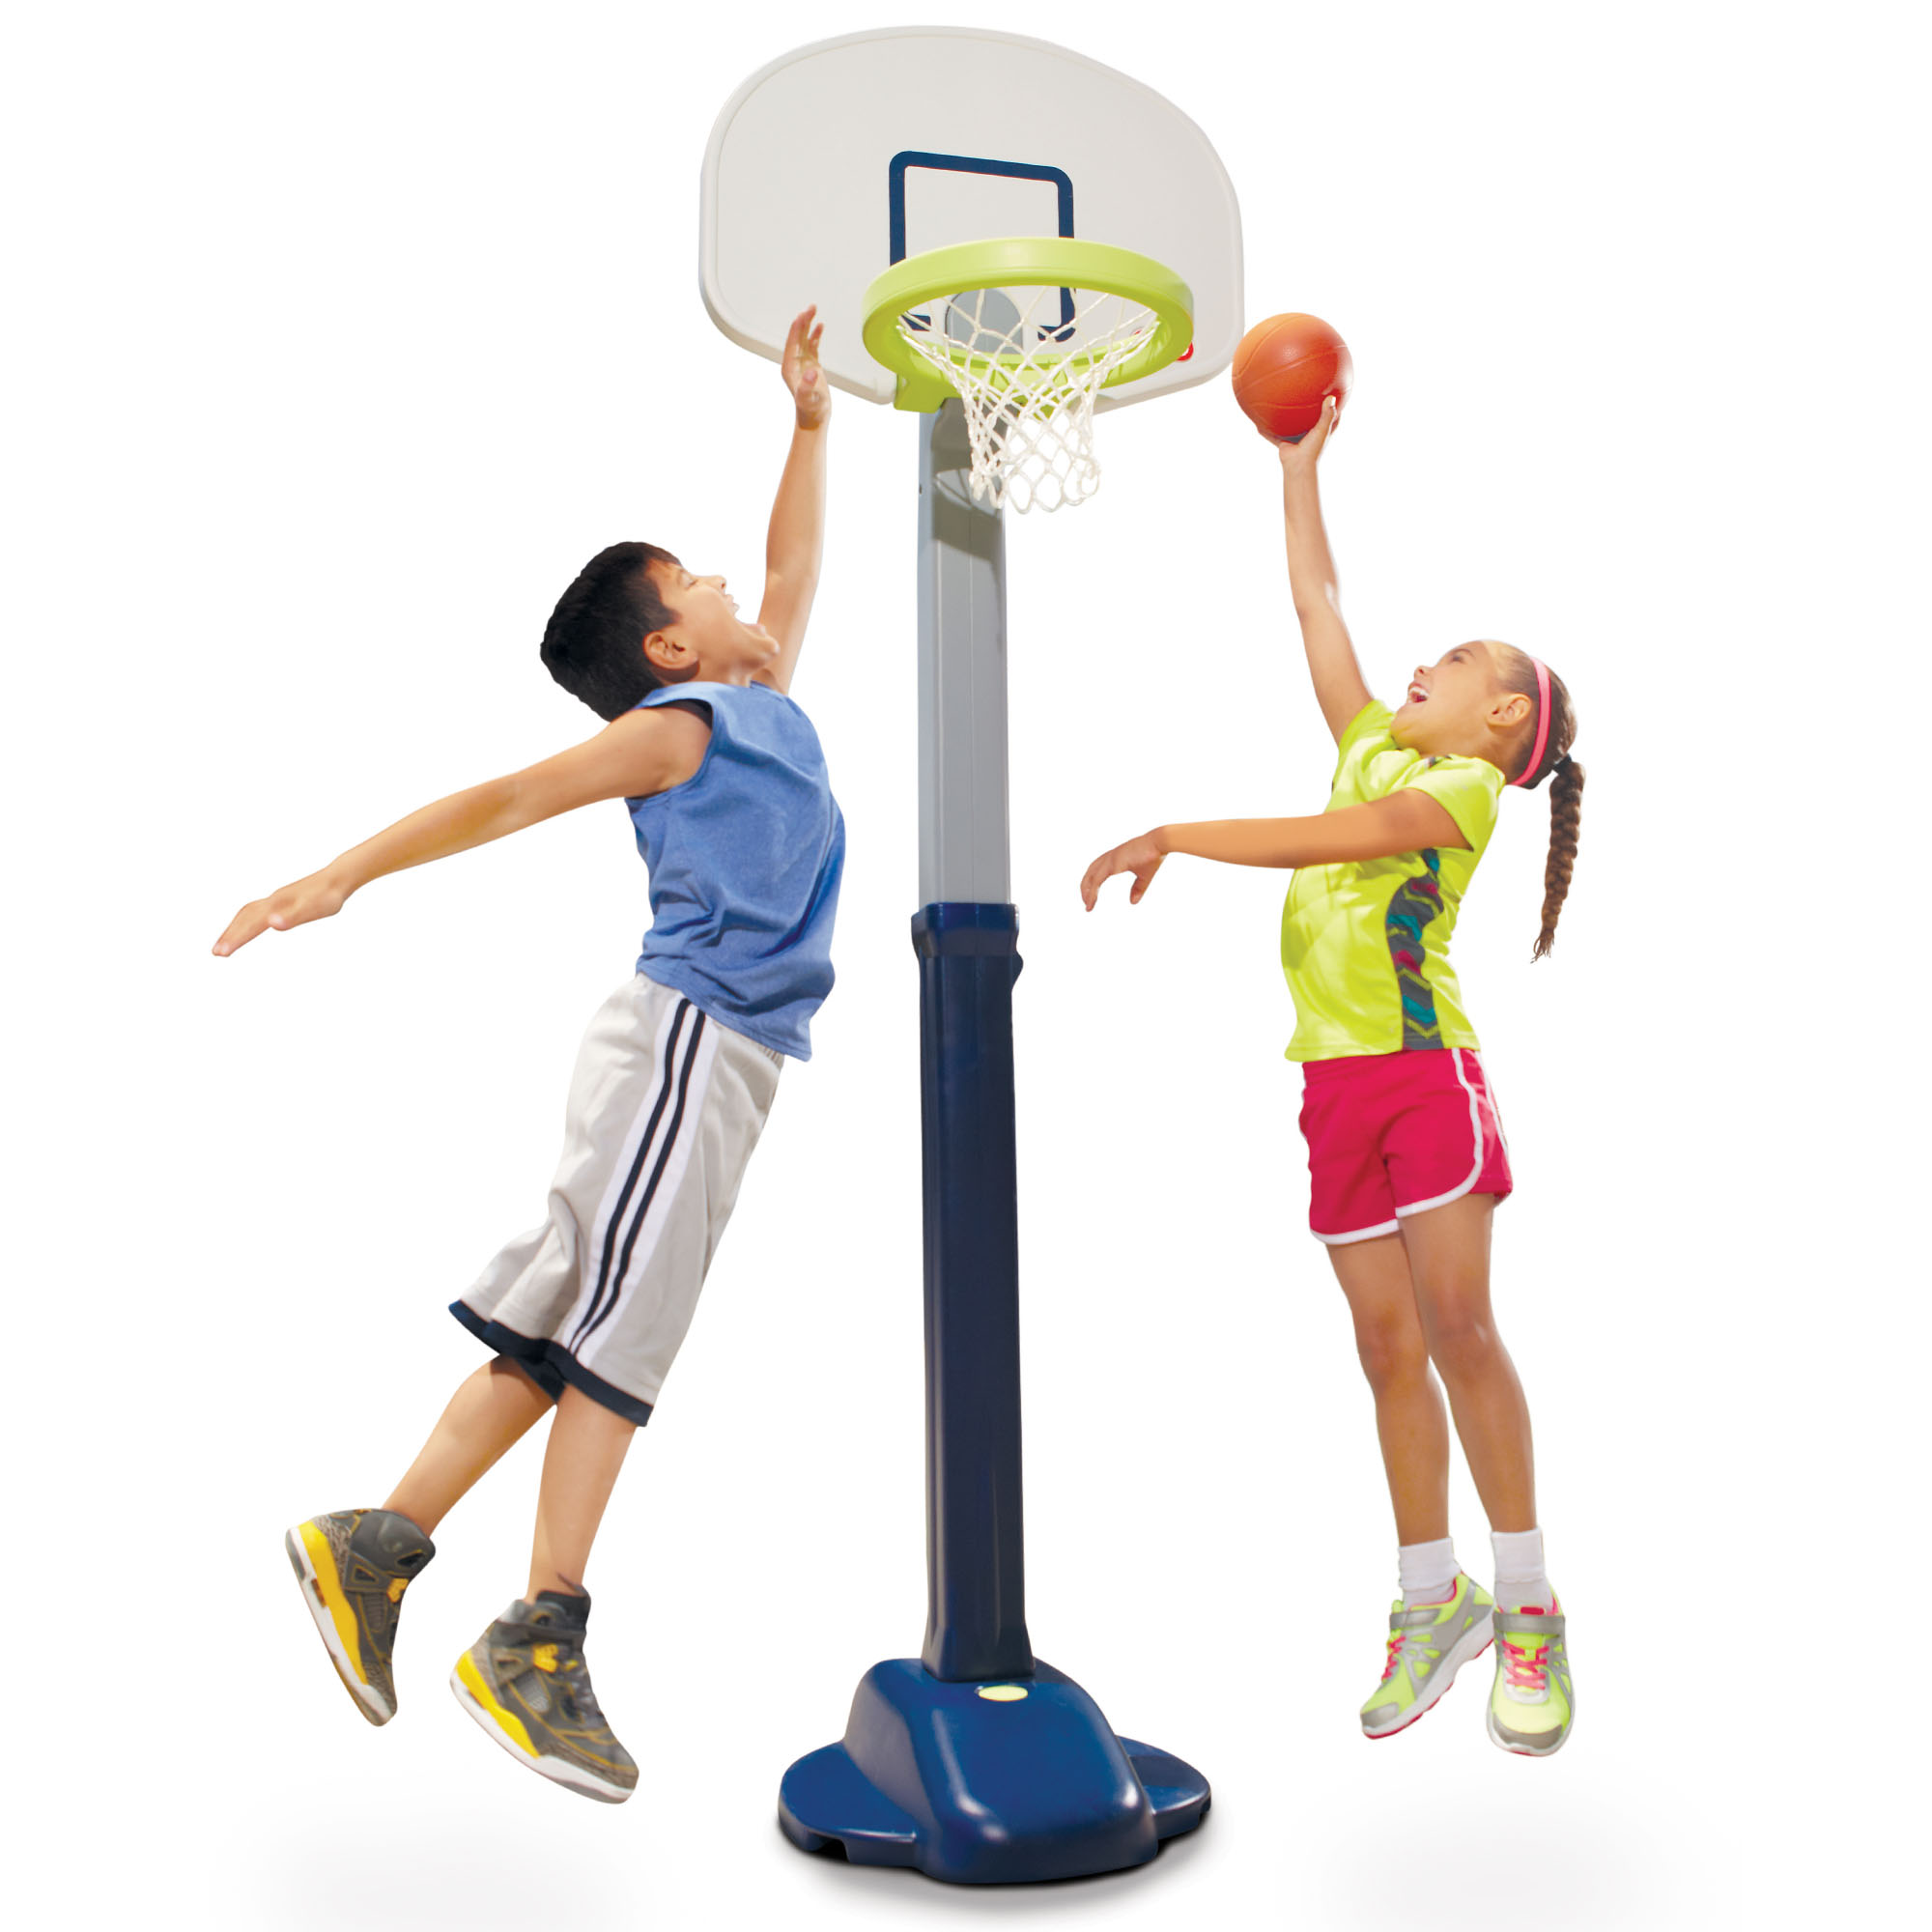 Little Tikes Adjust 'n Jam Pro Basketball Set by Little Tikes